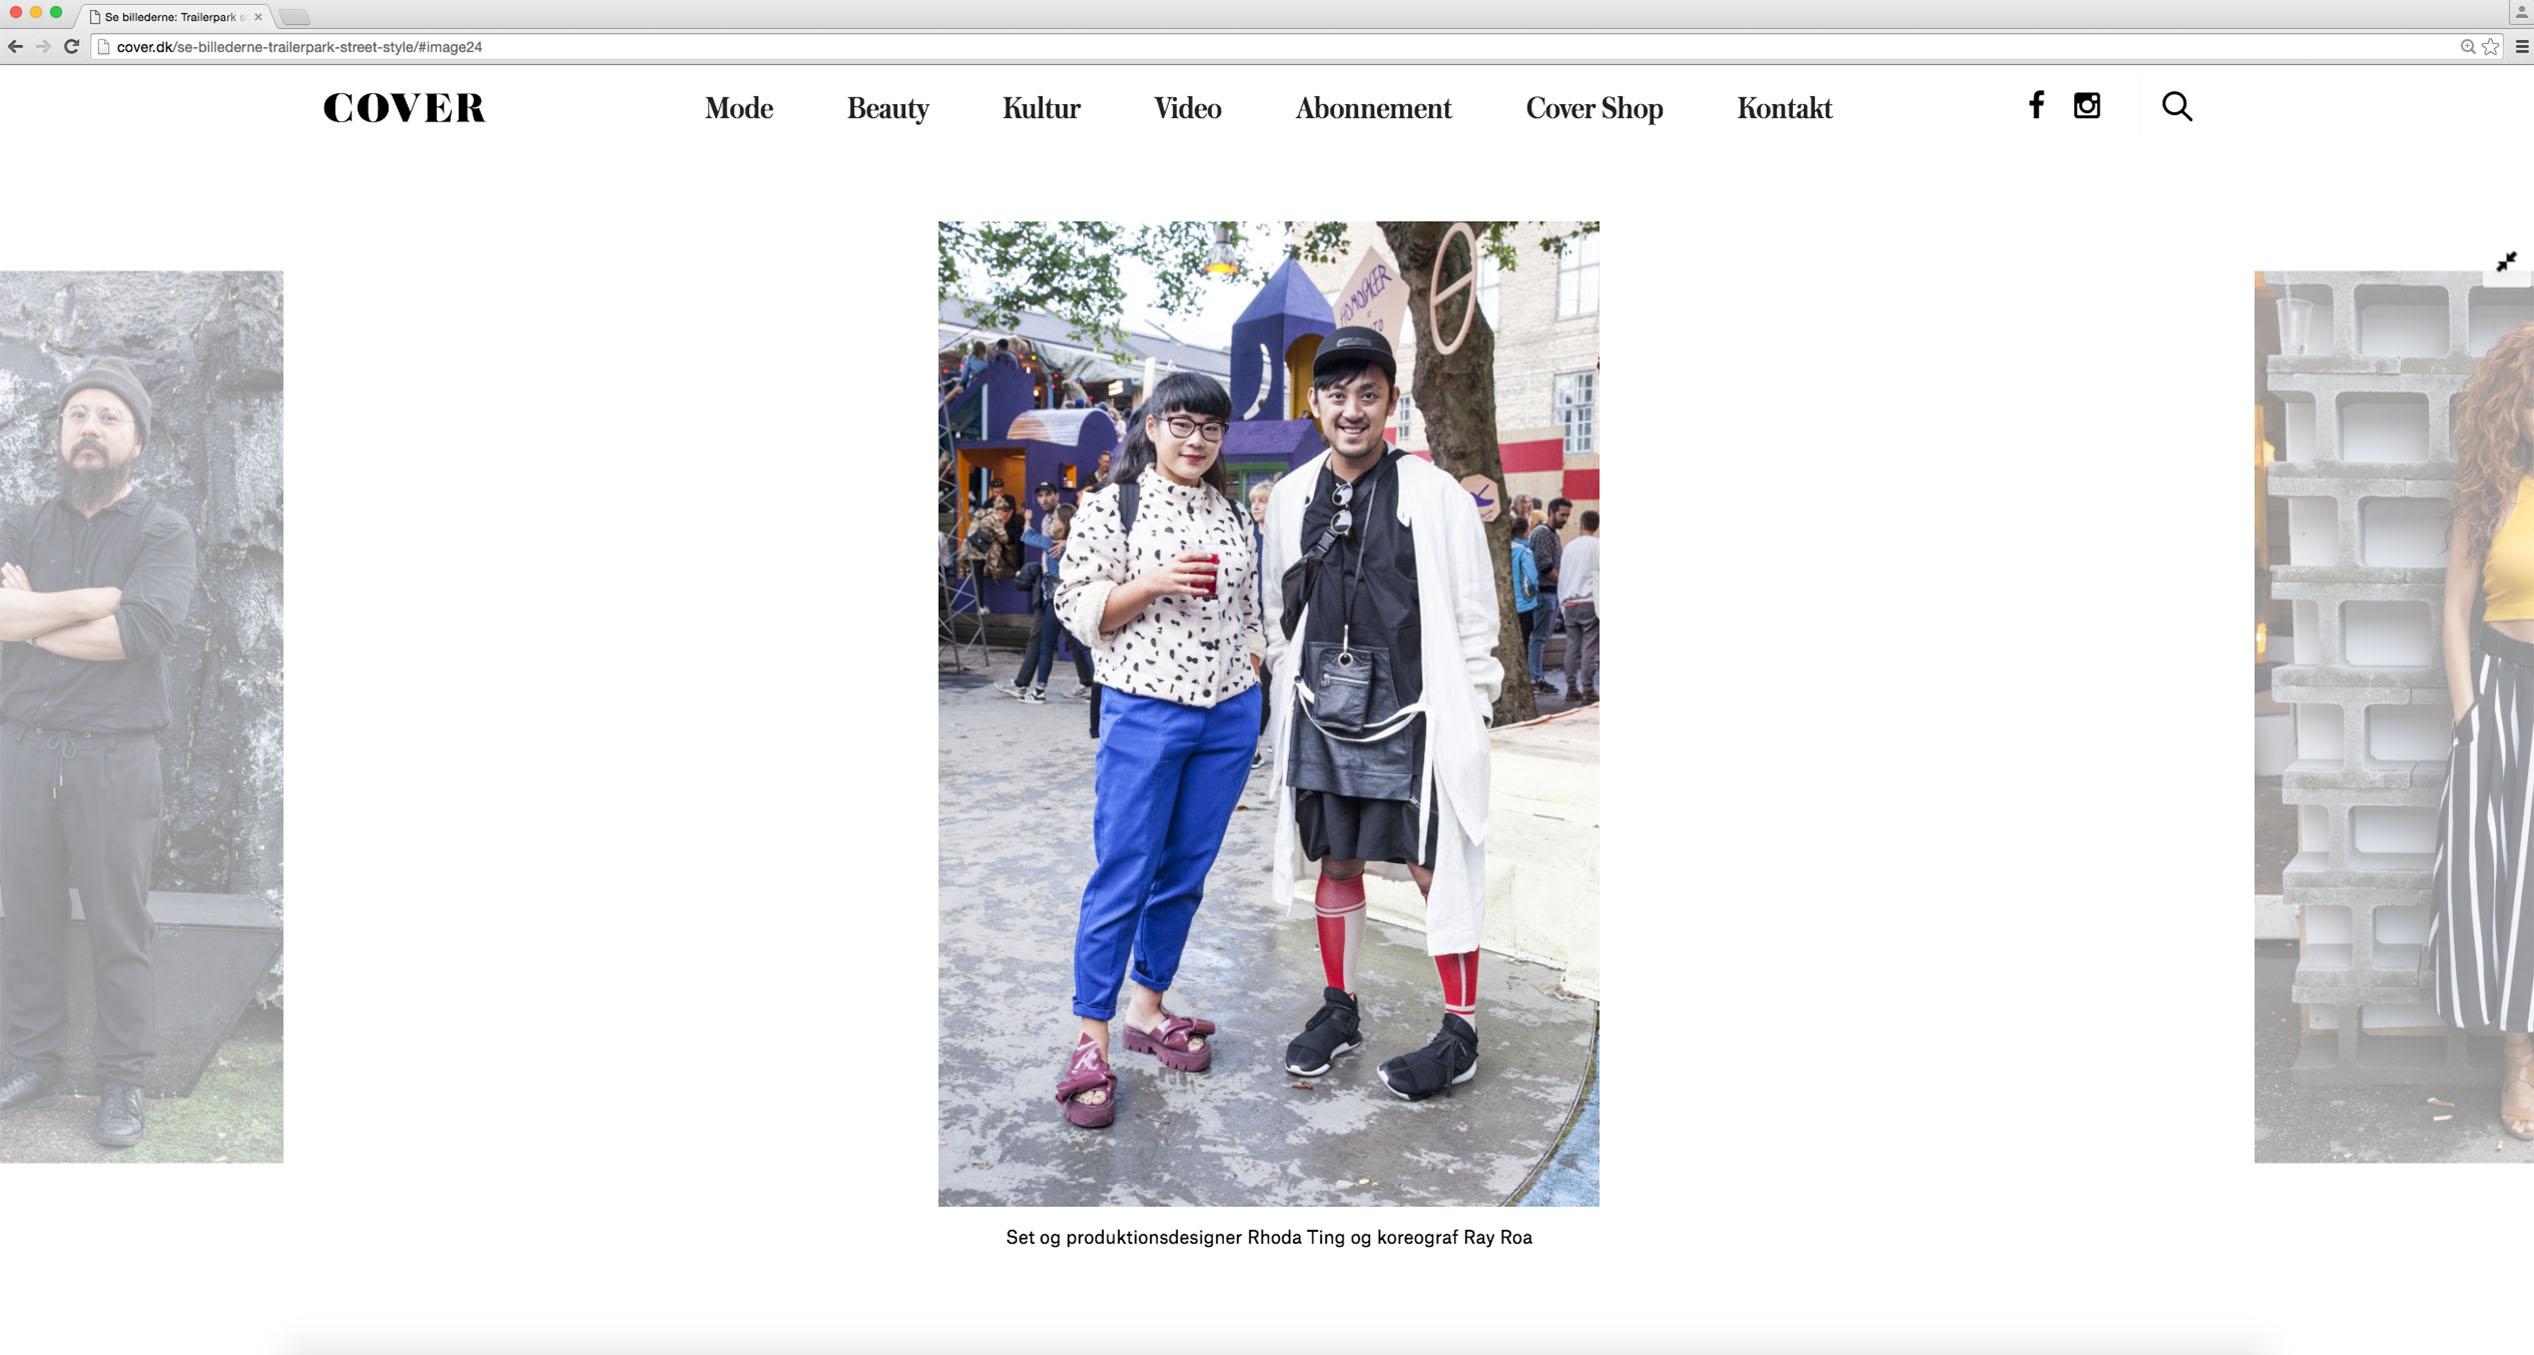 Streetstyle_CoverMagazine_TrailerparkFestival2016_24